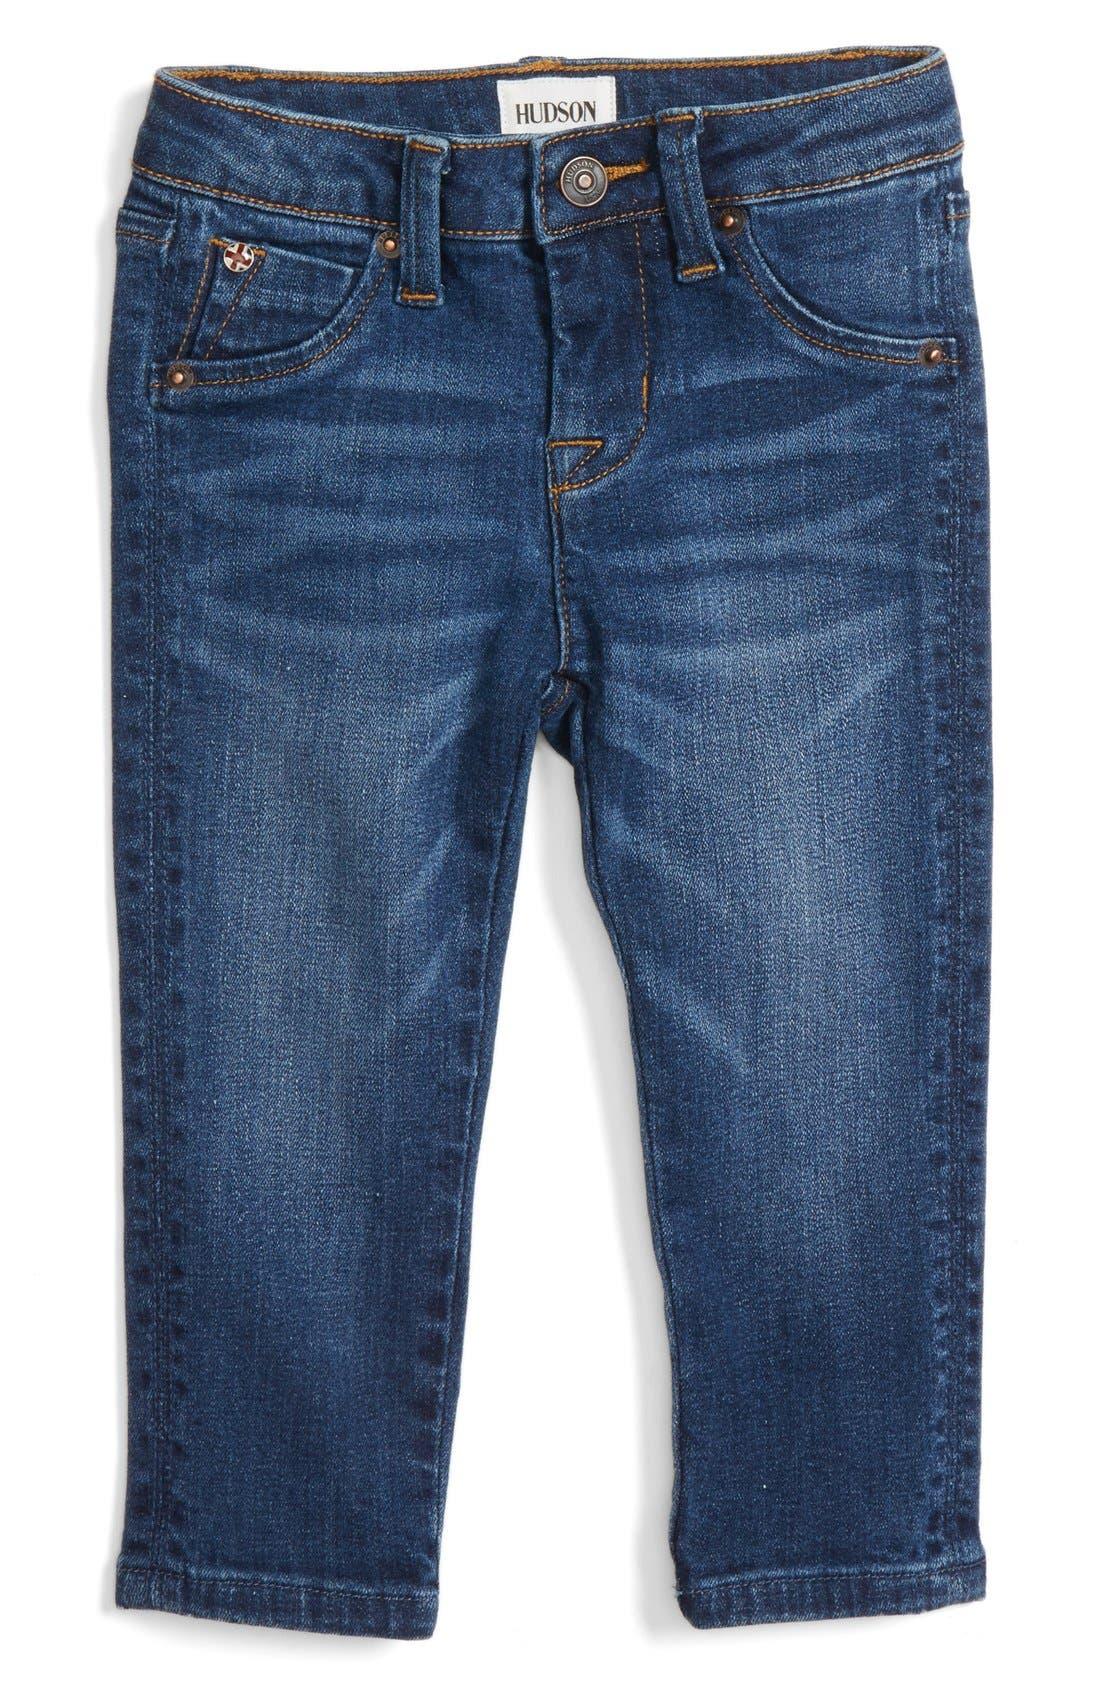 Alternate Image 1 Selected - Hudson 'Collin' Skinny Jeans (Baby Girls)